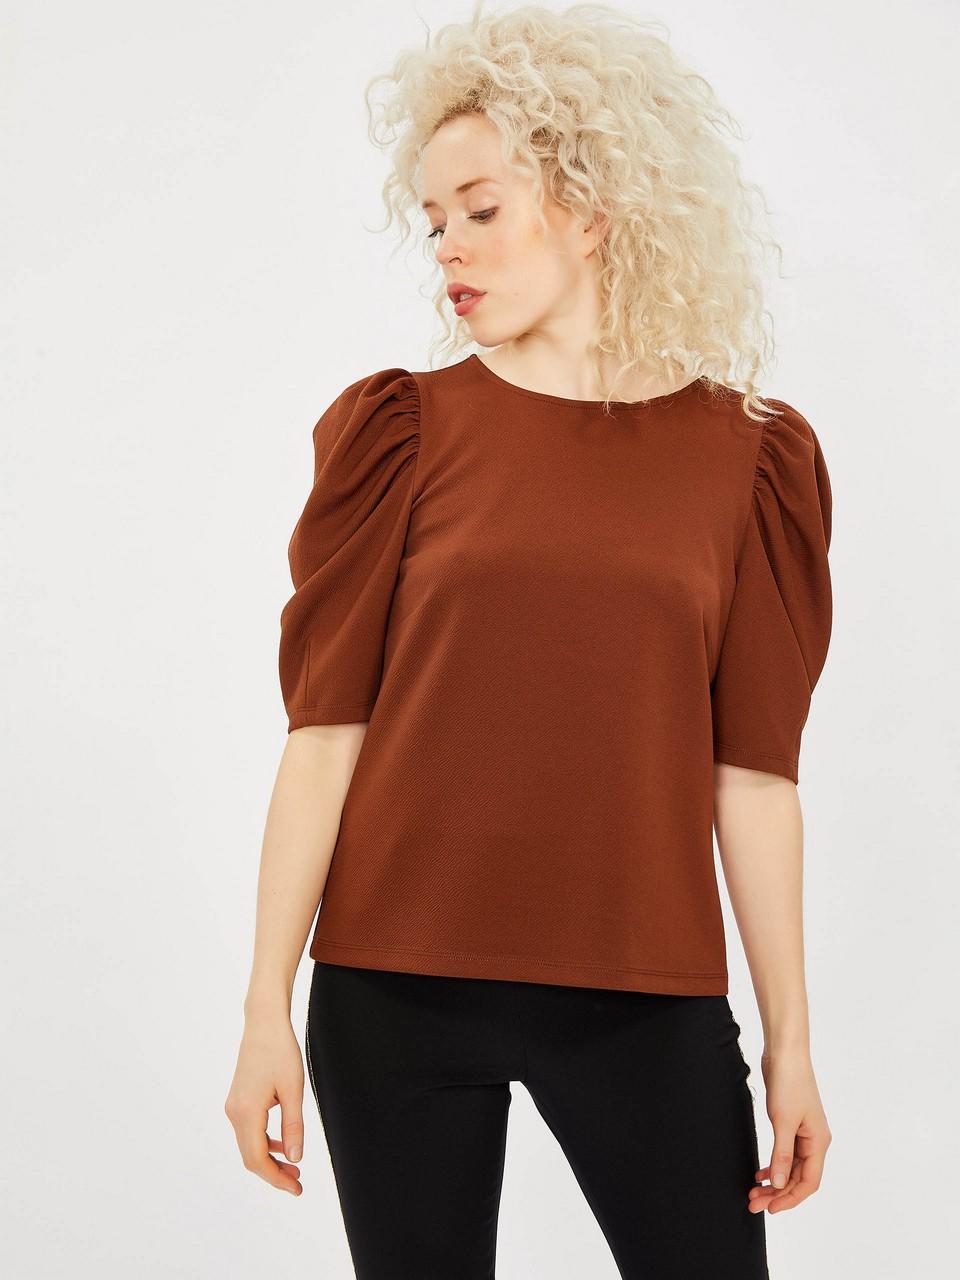 Shortcut Sleeve Shirt Blouse